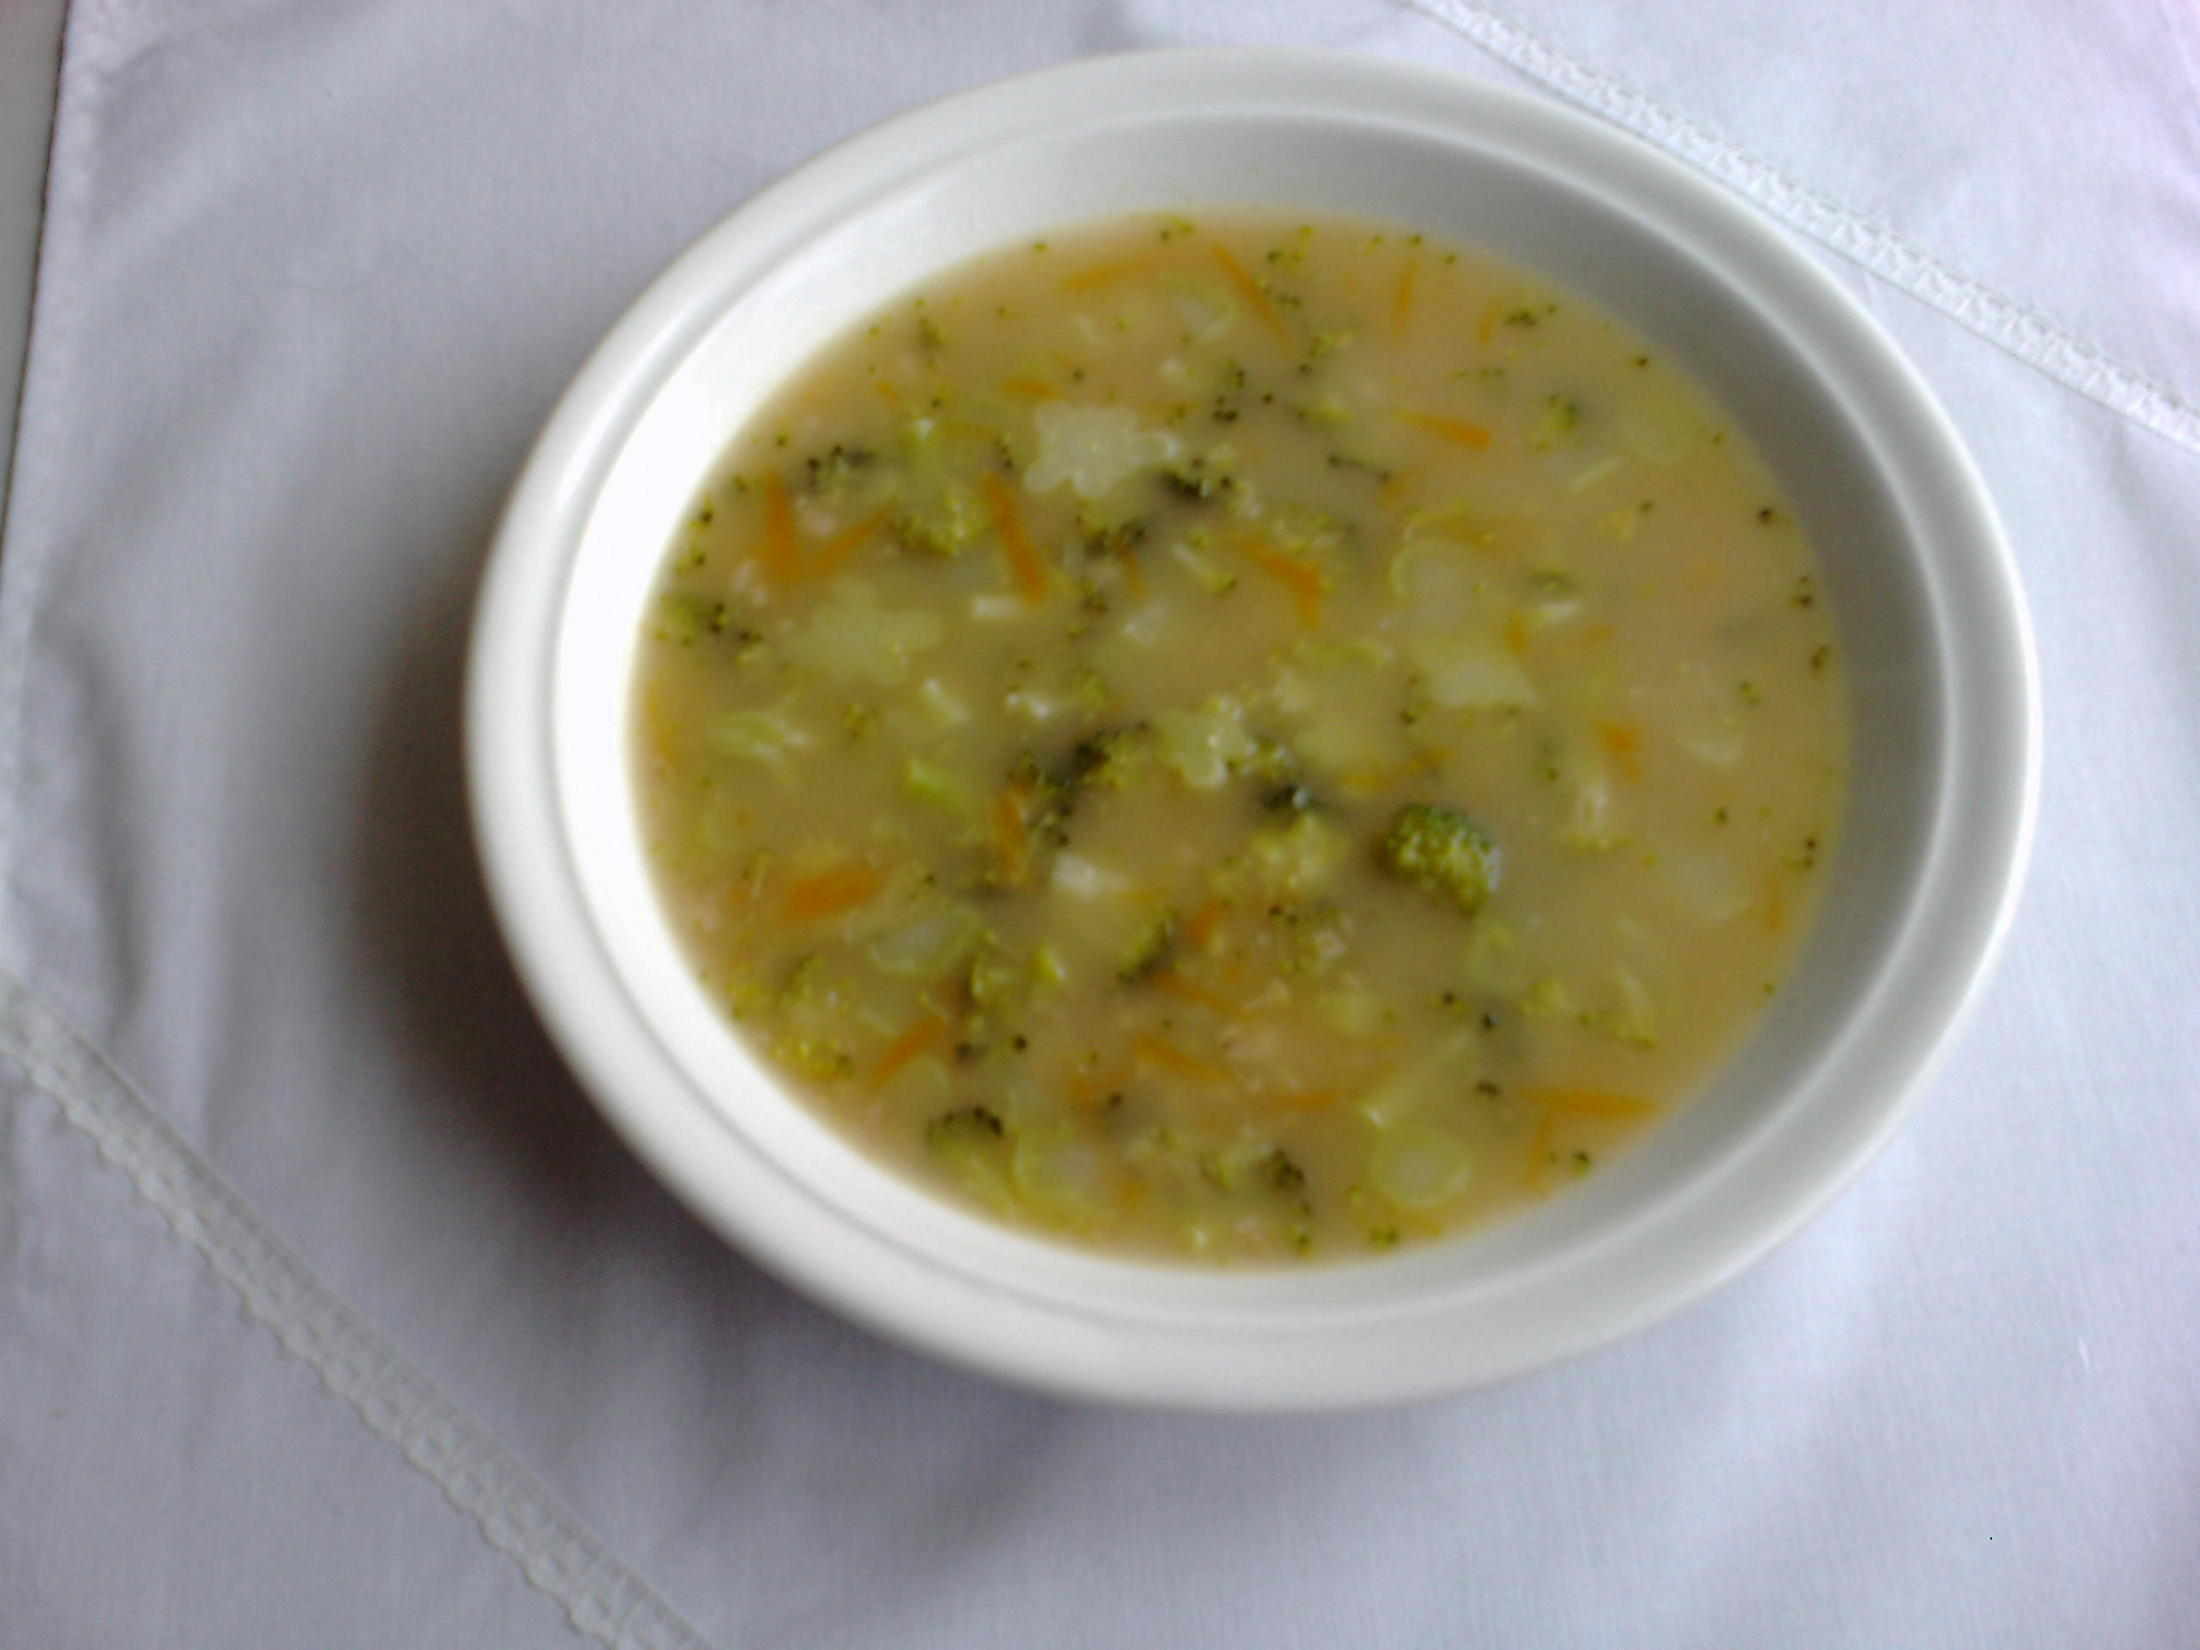 Fotografie receptu: Brokolicová polévka s vločkami